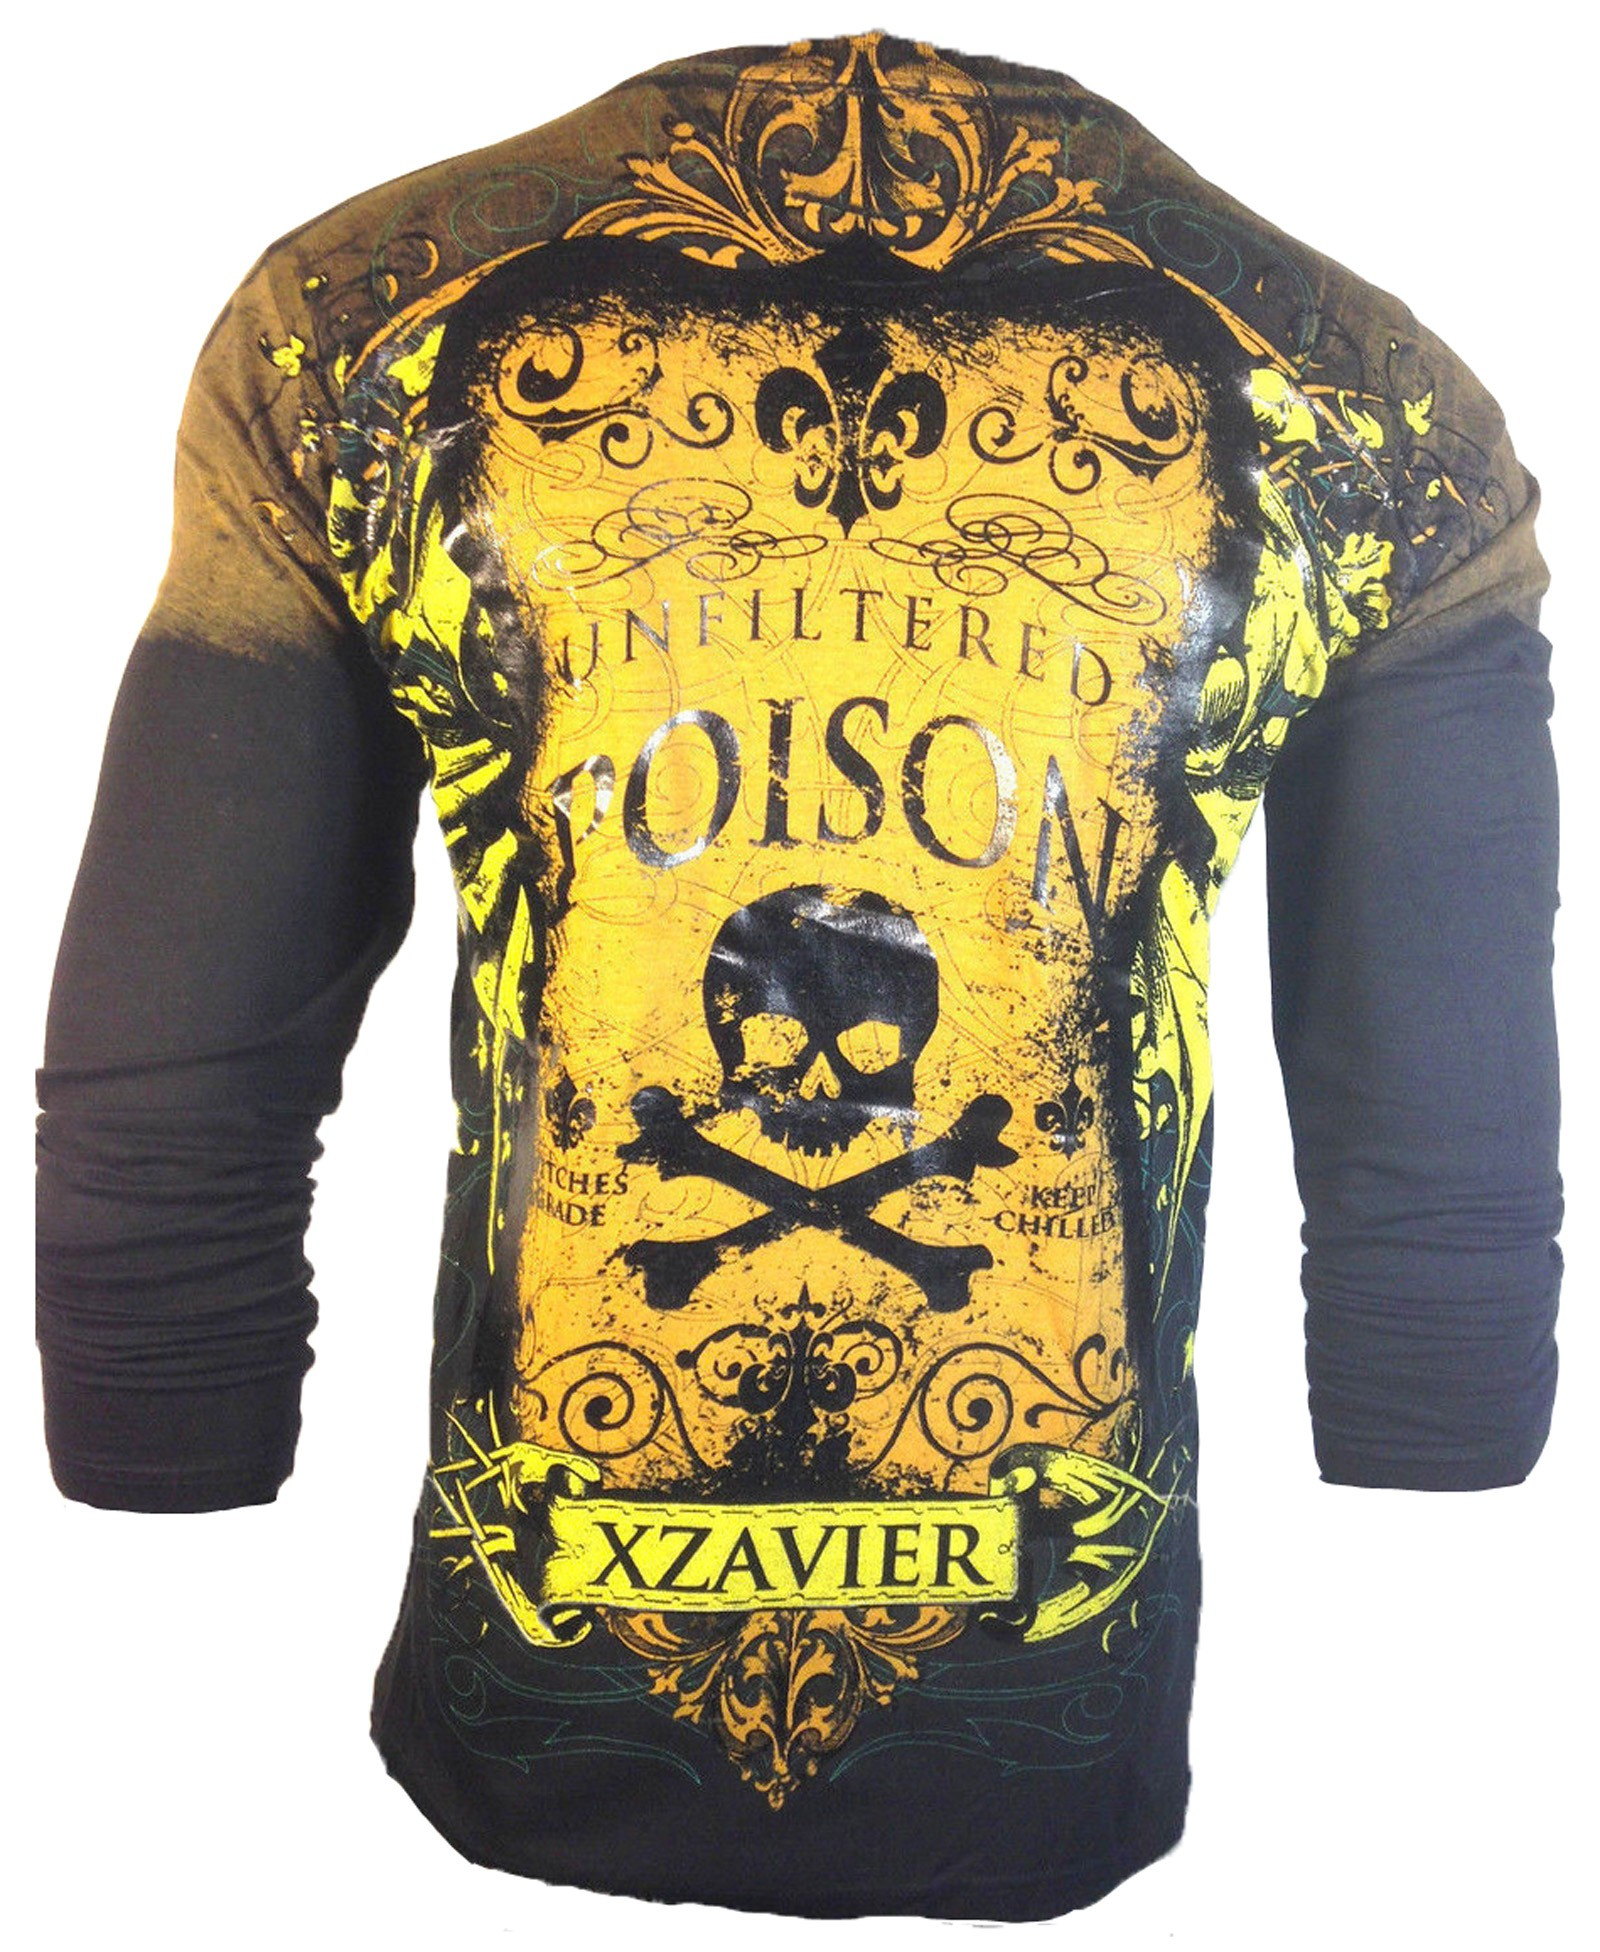 Xzavier - Unfiltered Poison Longsleeve T-Shirt Back